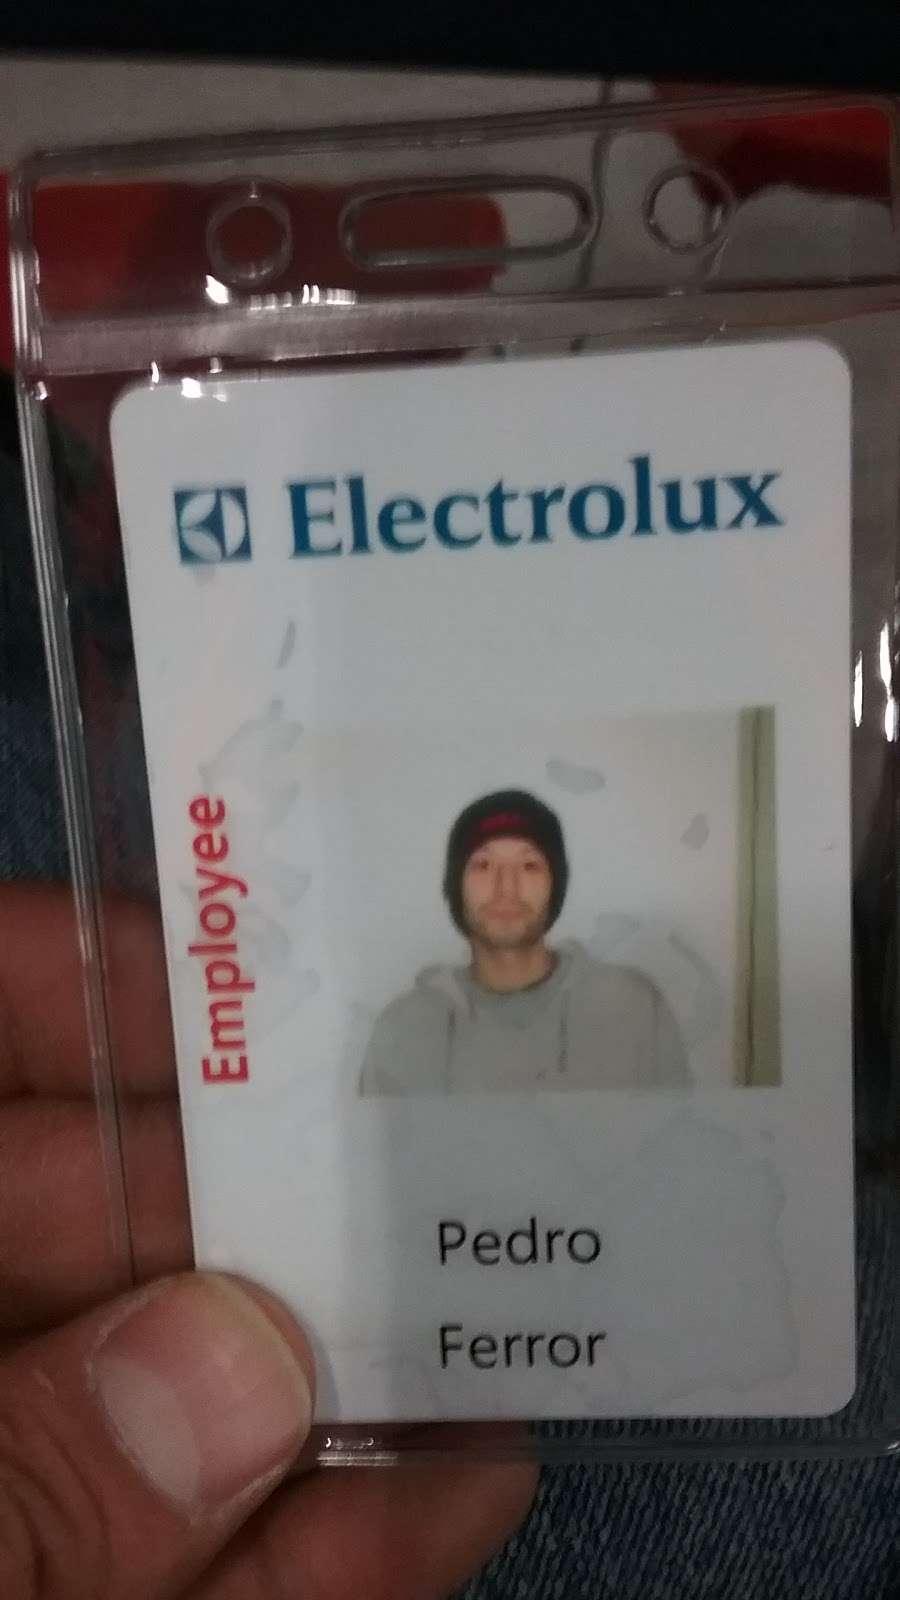 Electrolux - storage  | Photo 8 of 8 | Address: 801 Mid Point Rd, Minooka, IL 60447, USA | Phone: (815) 521-2200